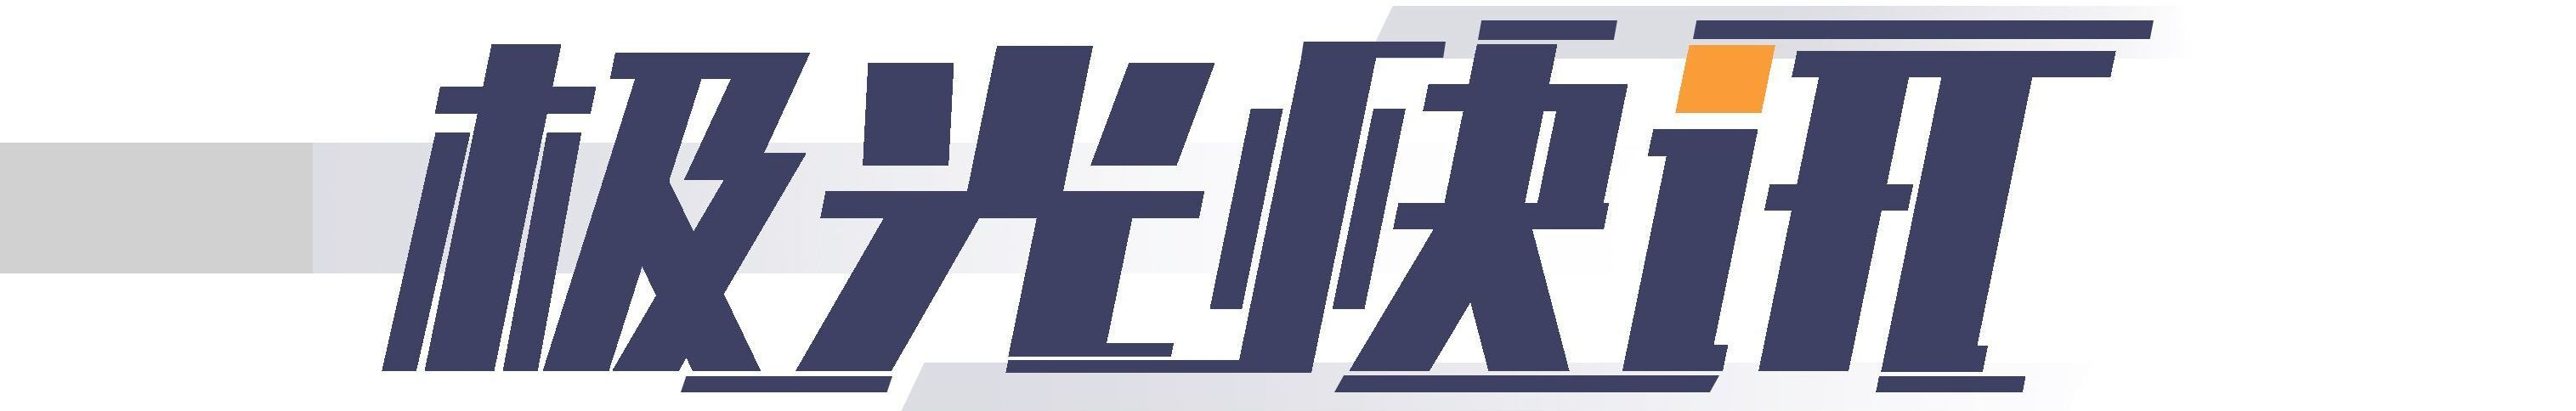 北极光科技工作室 banner